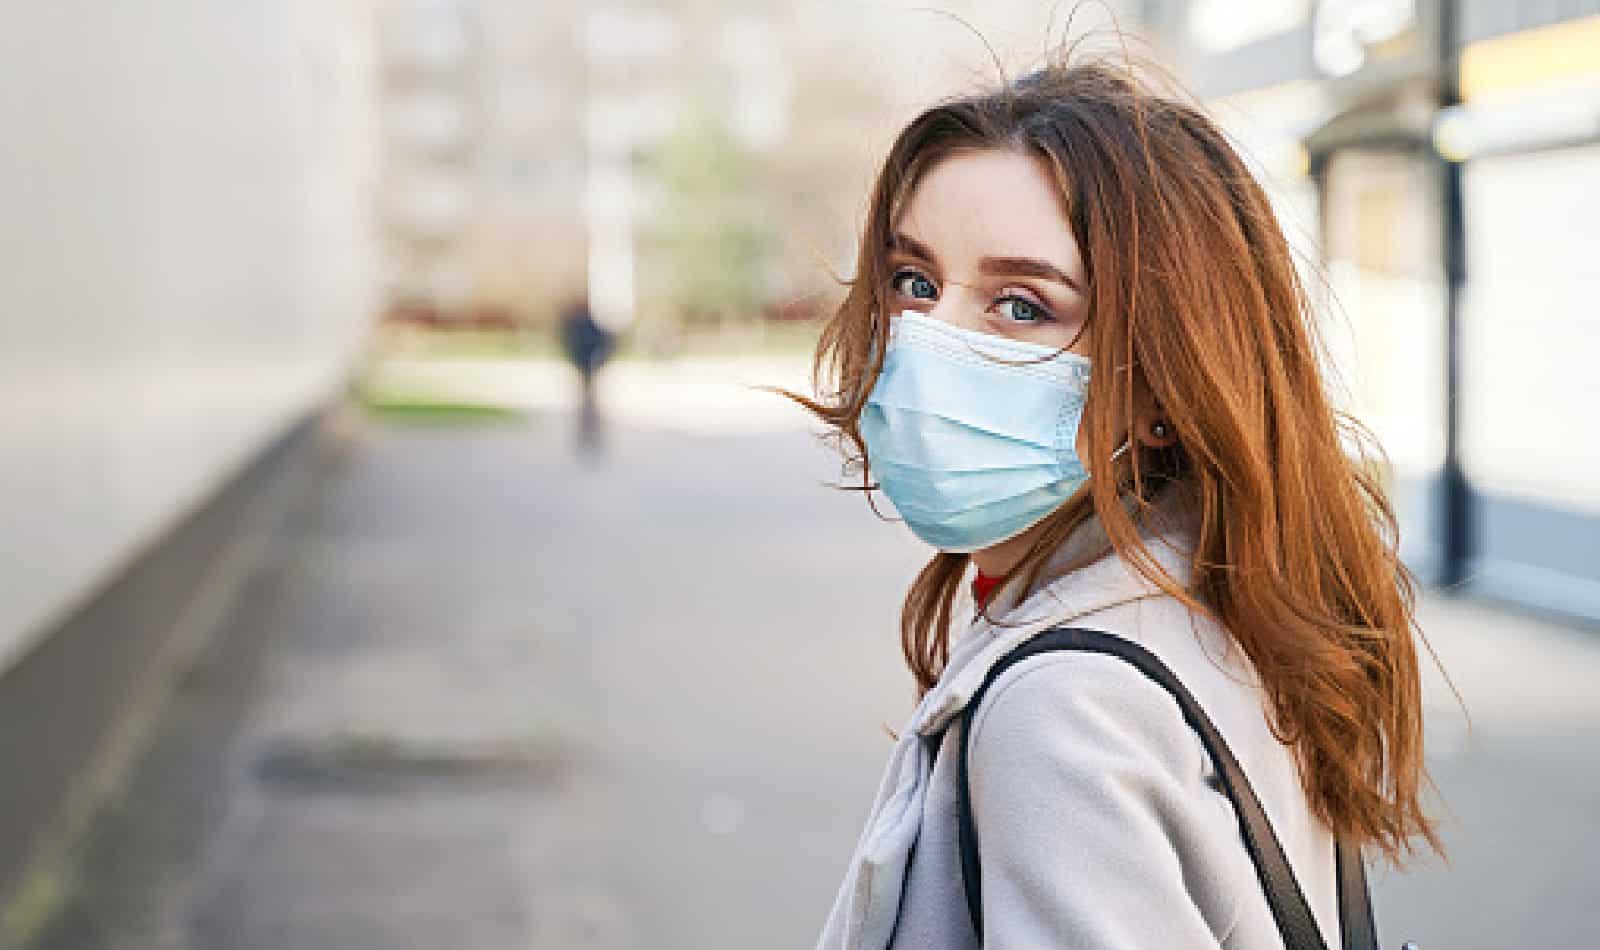 Concept of coronavirus quarantine and pandemic